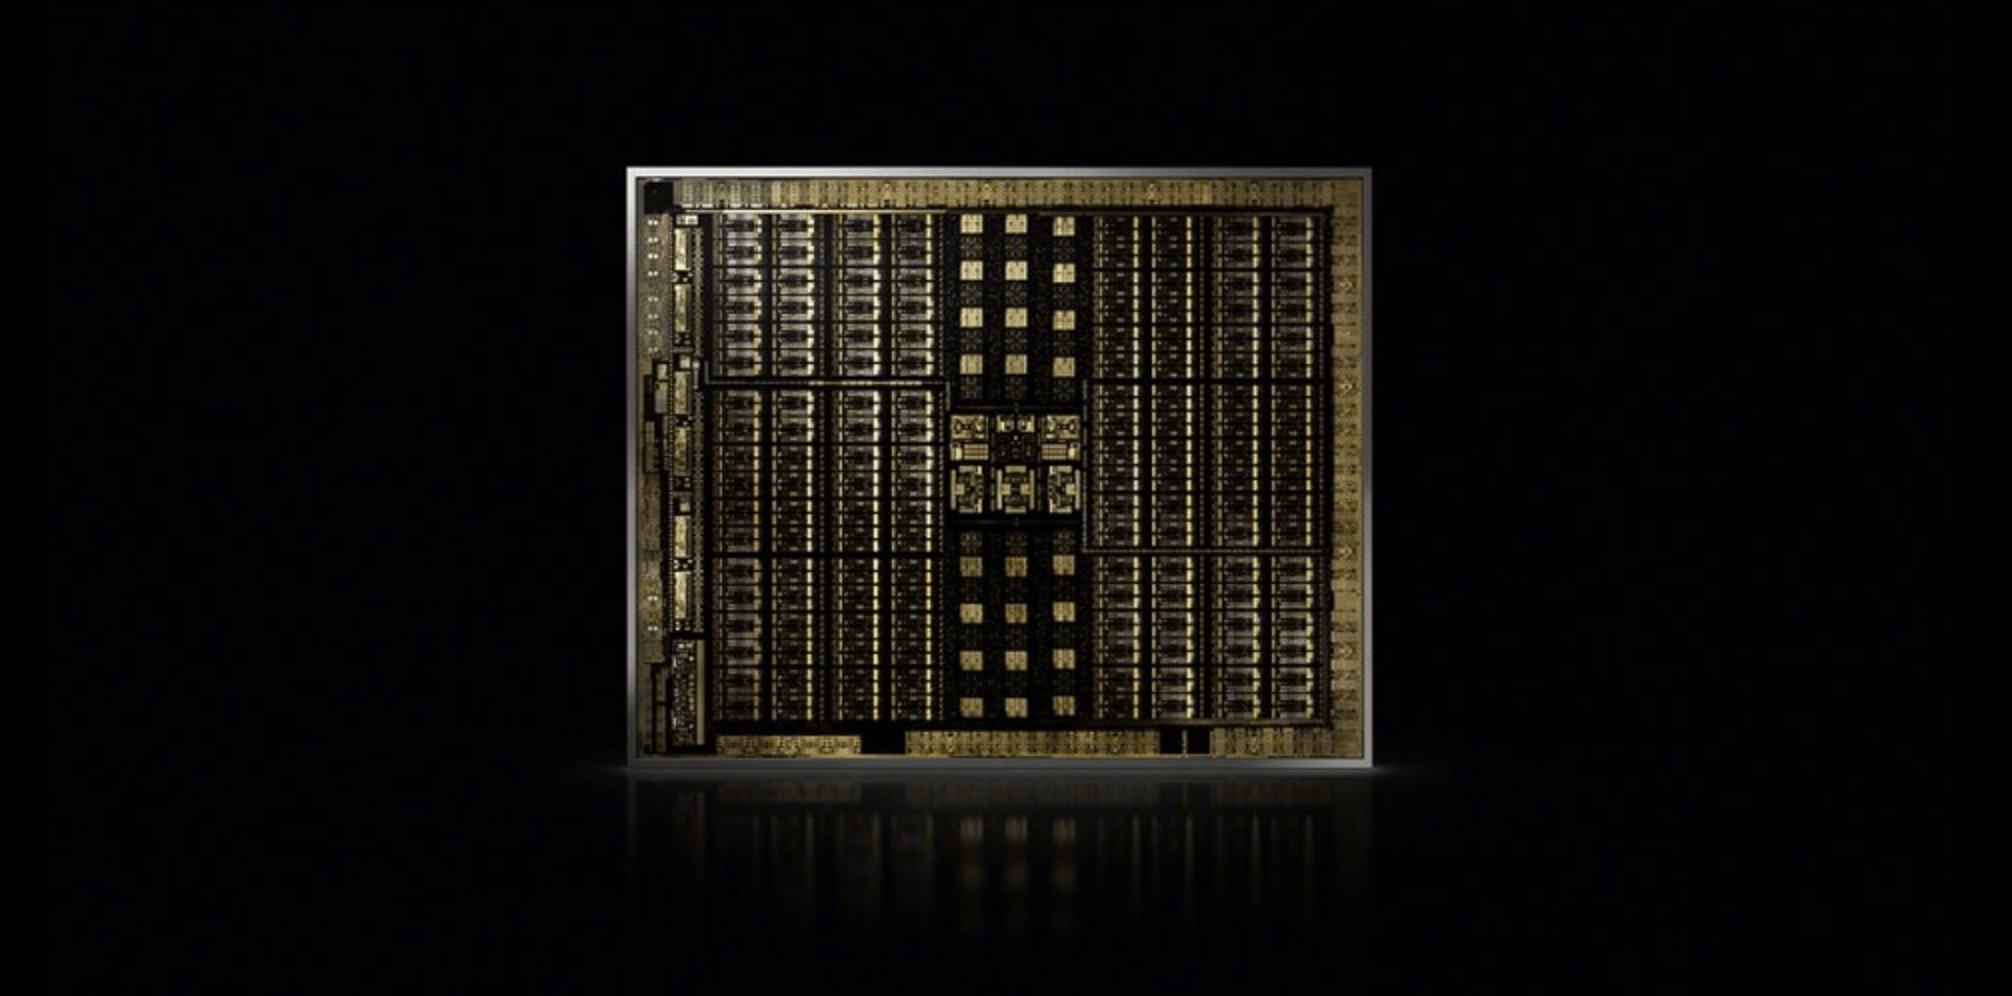 Nvidia annonce son architecture Turing et ses cartes Quadro RTX : prêtes pour le ray-tracing